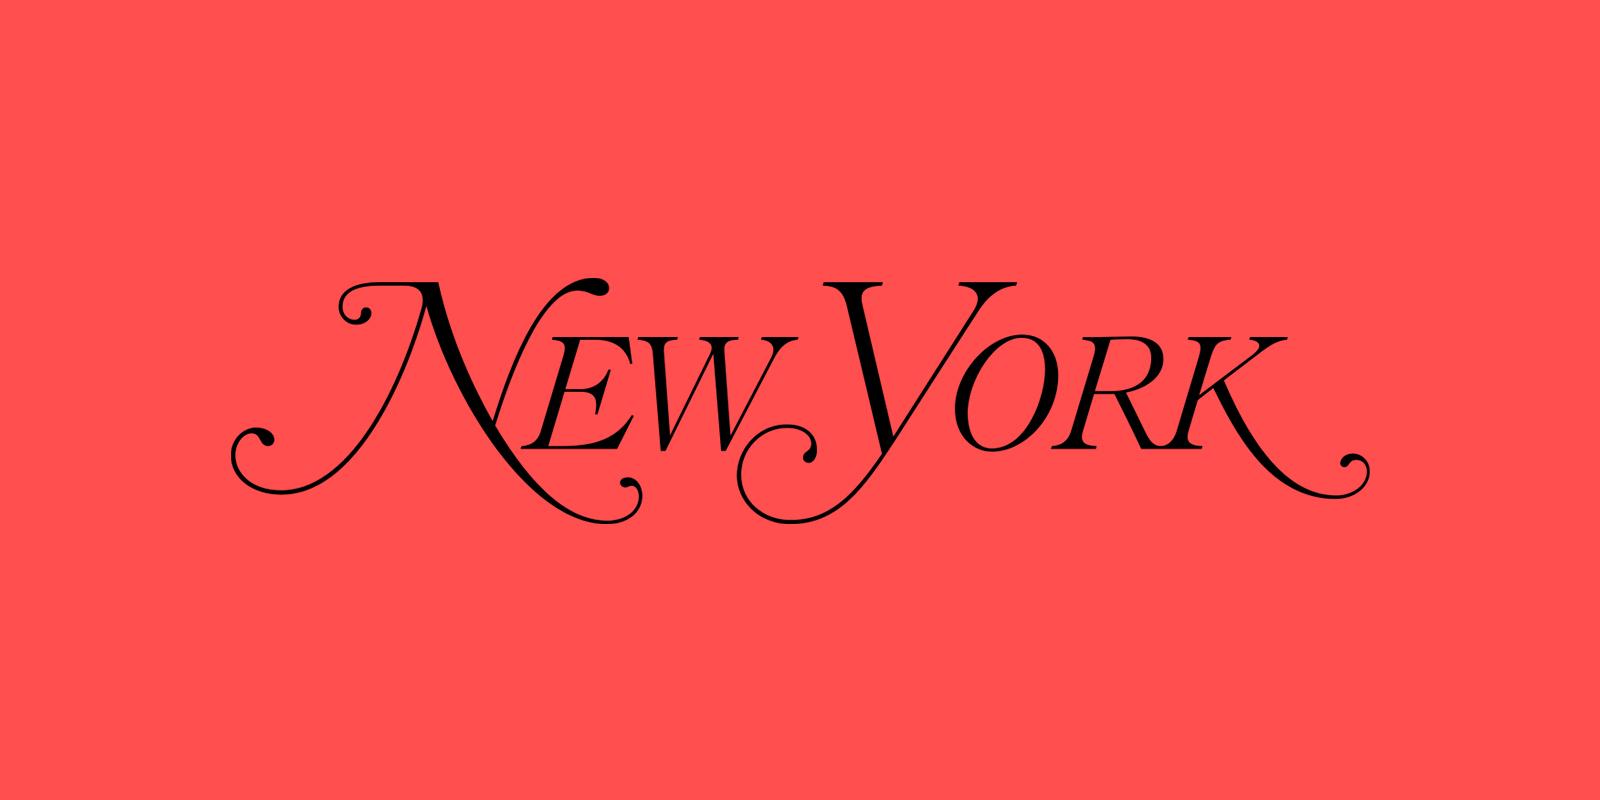 New York Magazine Logo Design Inspiration by Milton Glaser